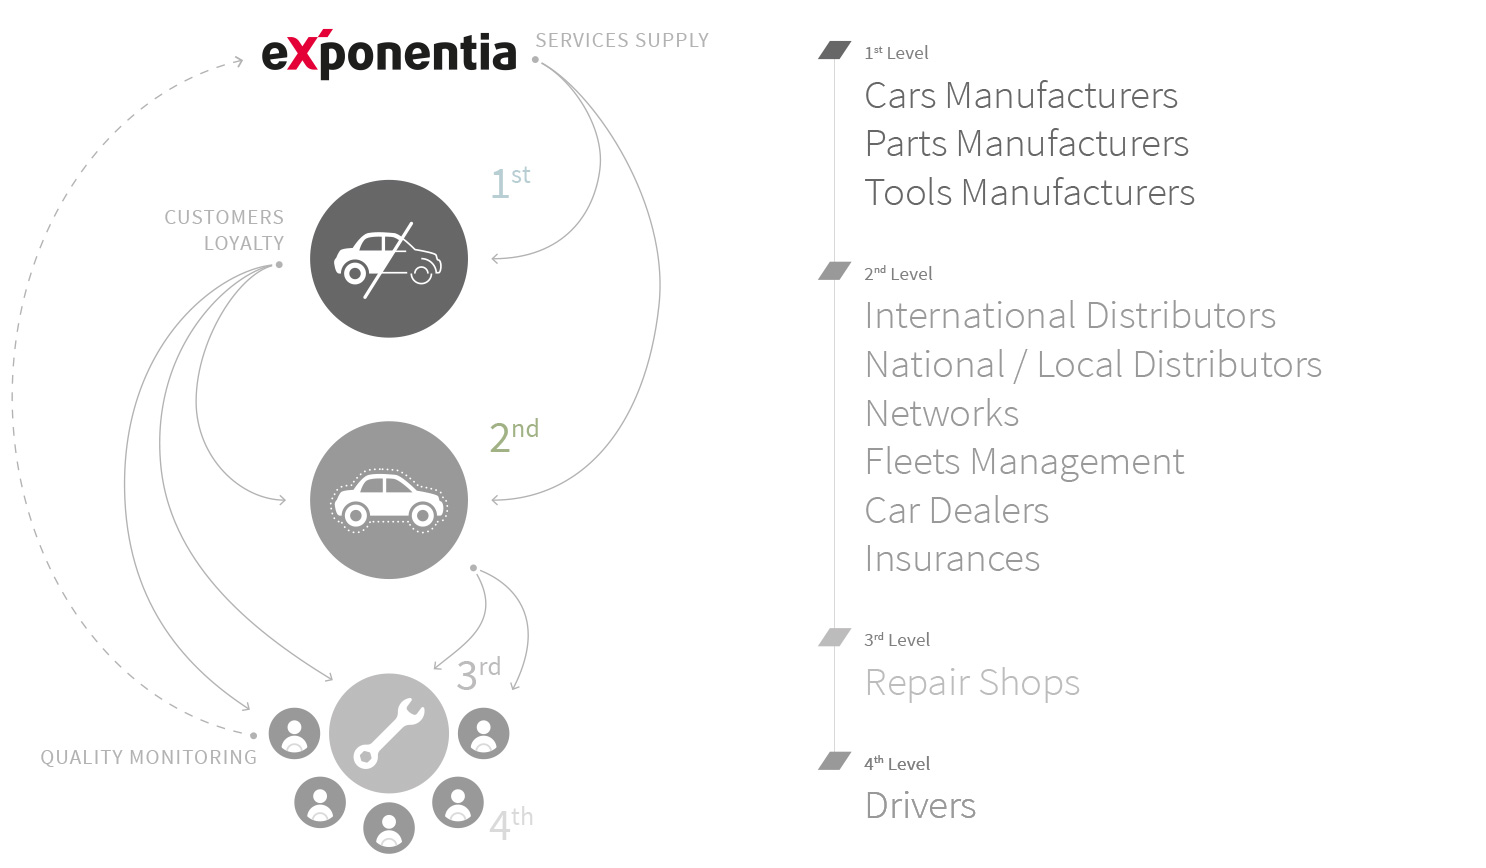 eXponentia Business Model